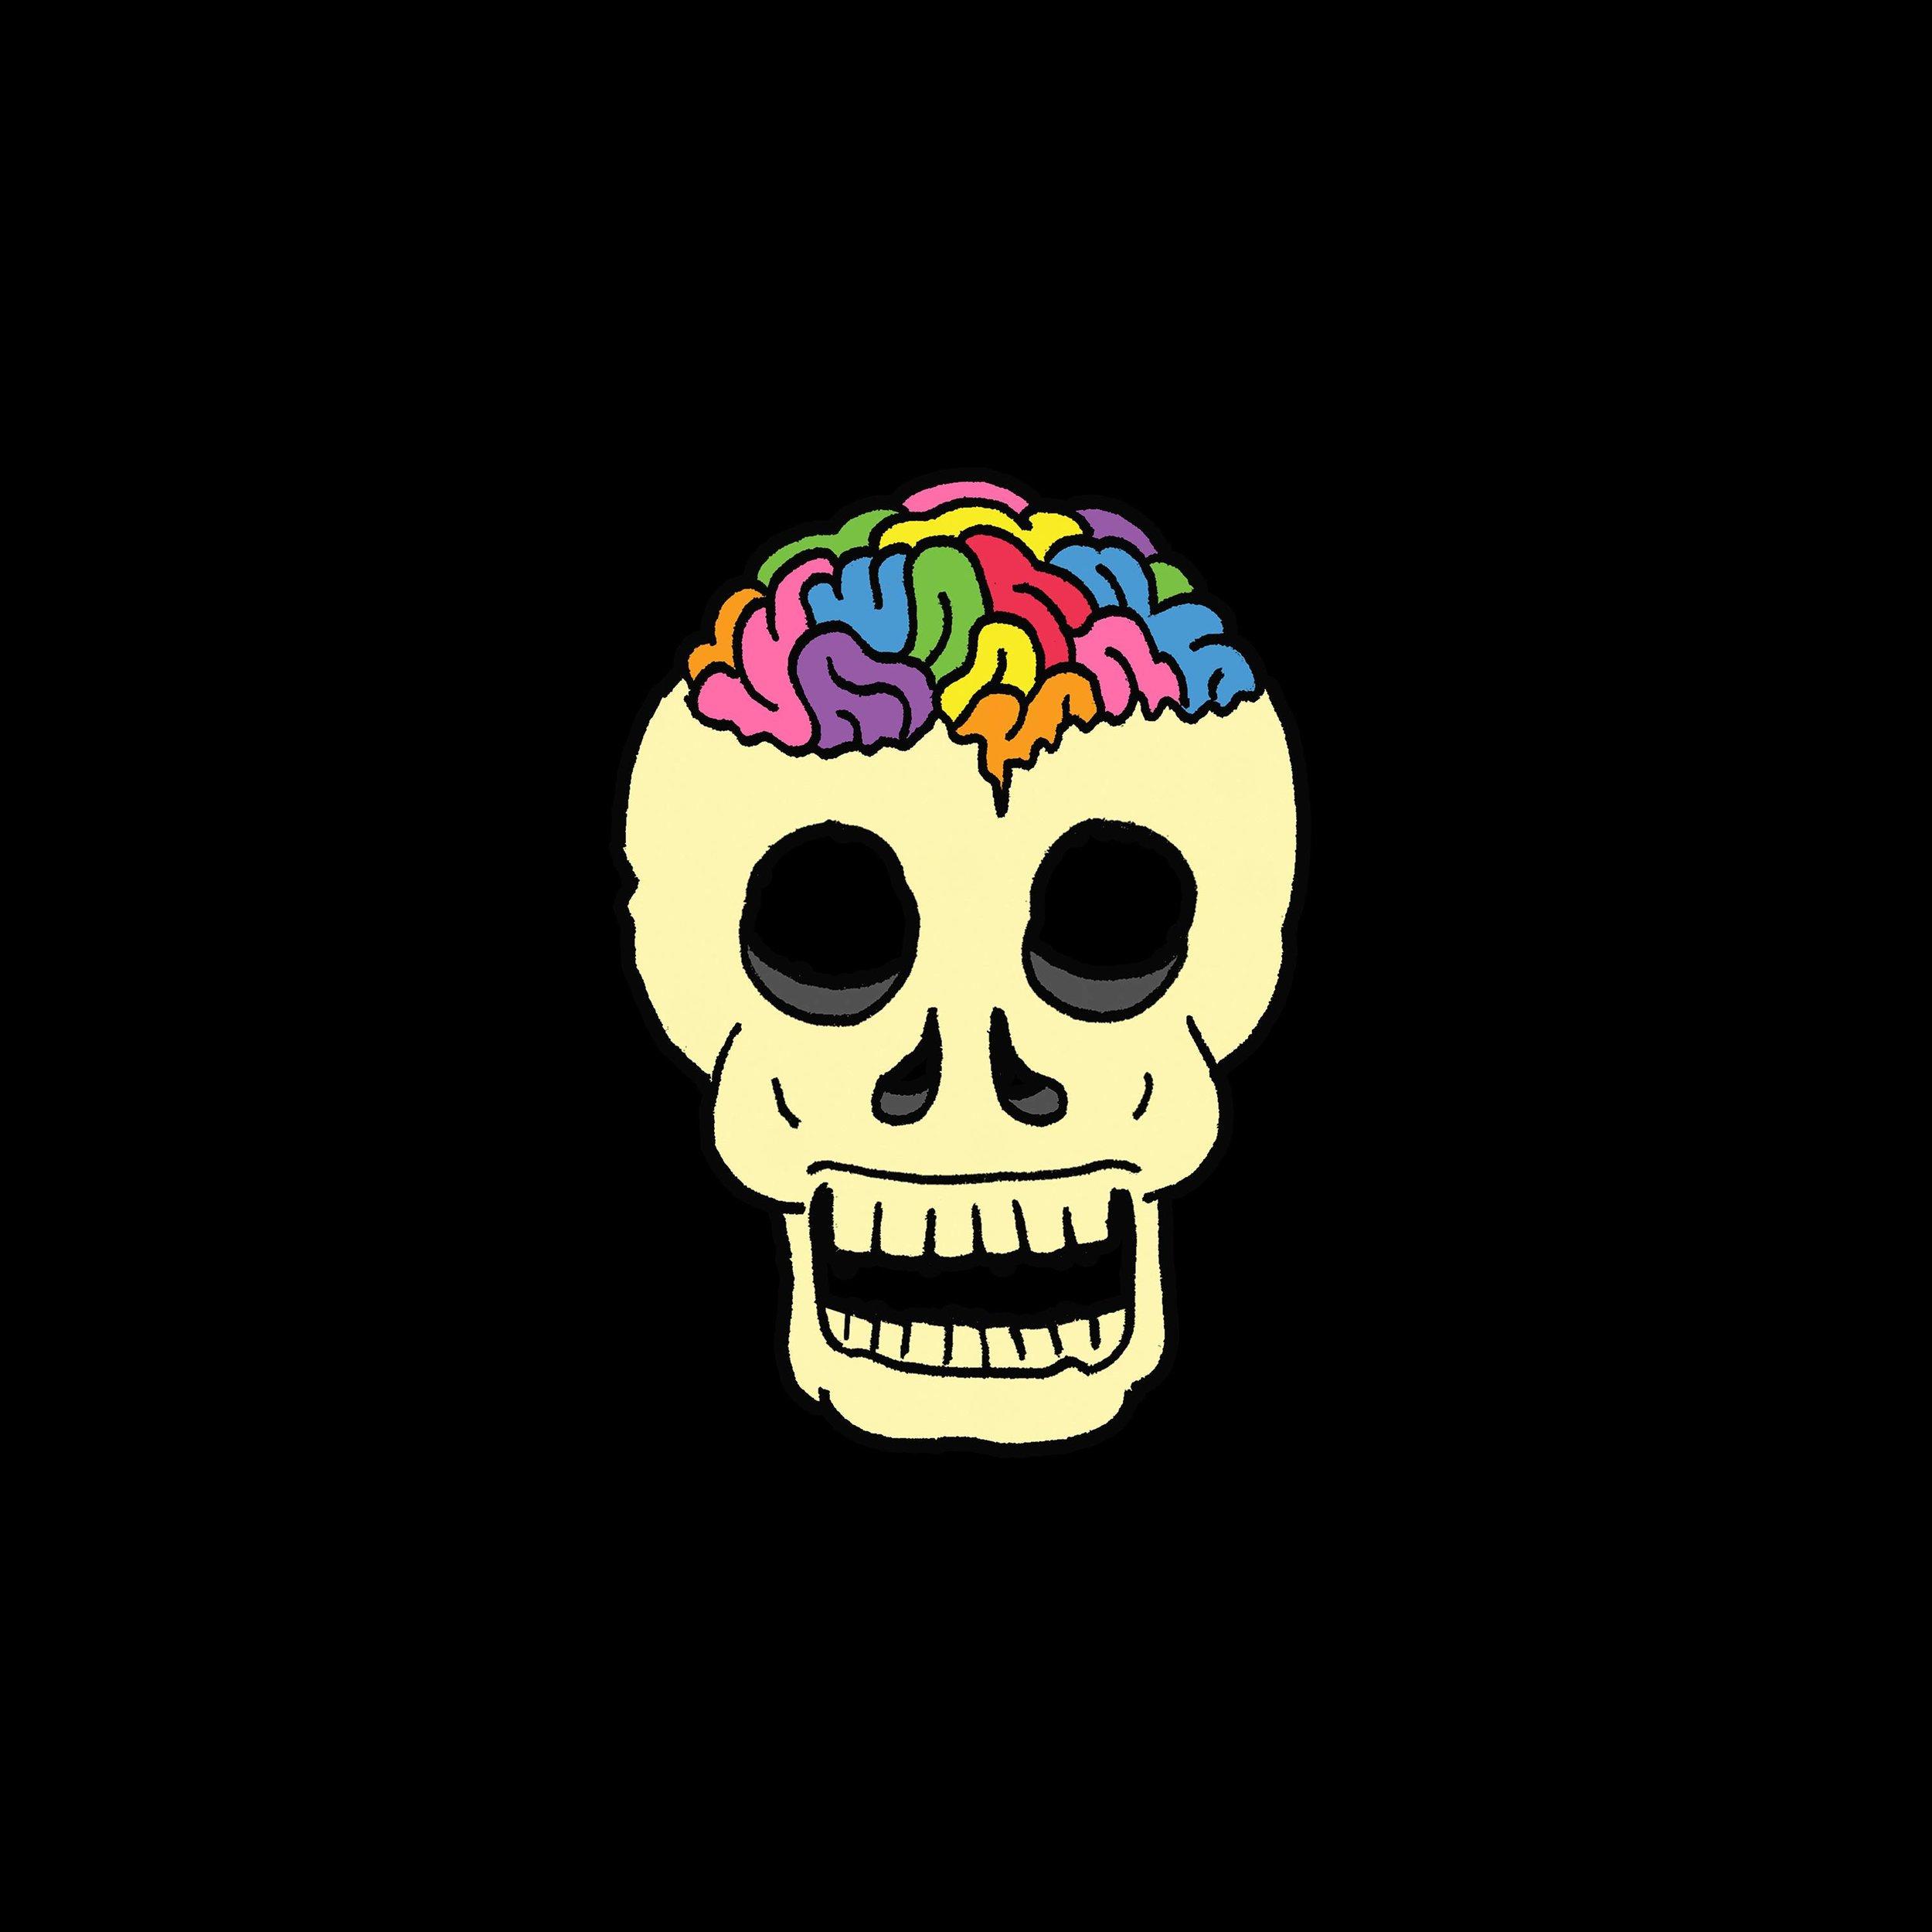 Podcast_artworks_1668_large_328c58f0f1726122097e75379a5d2ff5fe7b7c88799fb09ea3fe62ab269a1192_LOGO_RainbowBrainskull_3000.jpg